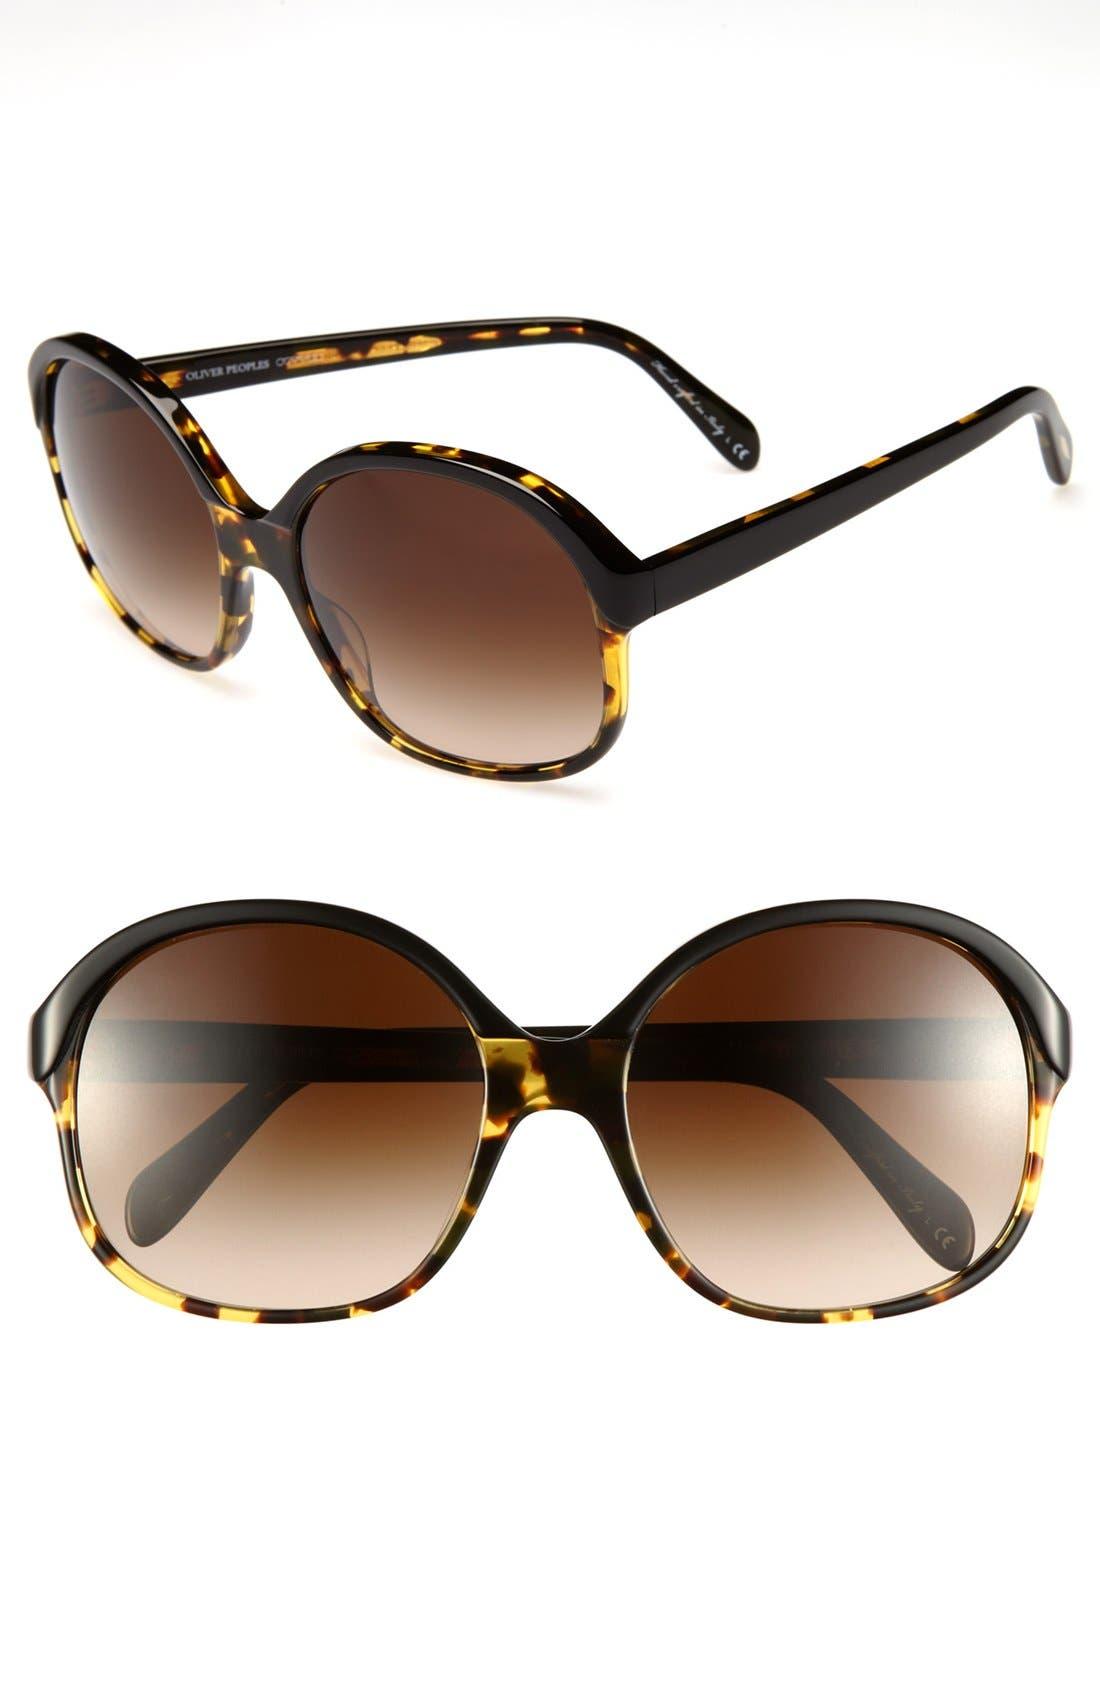 Main Image - Oliver Peoples 'Casandra' 61mm Sunglasses